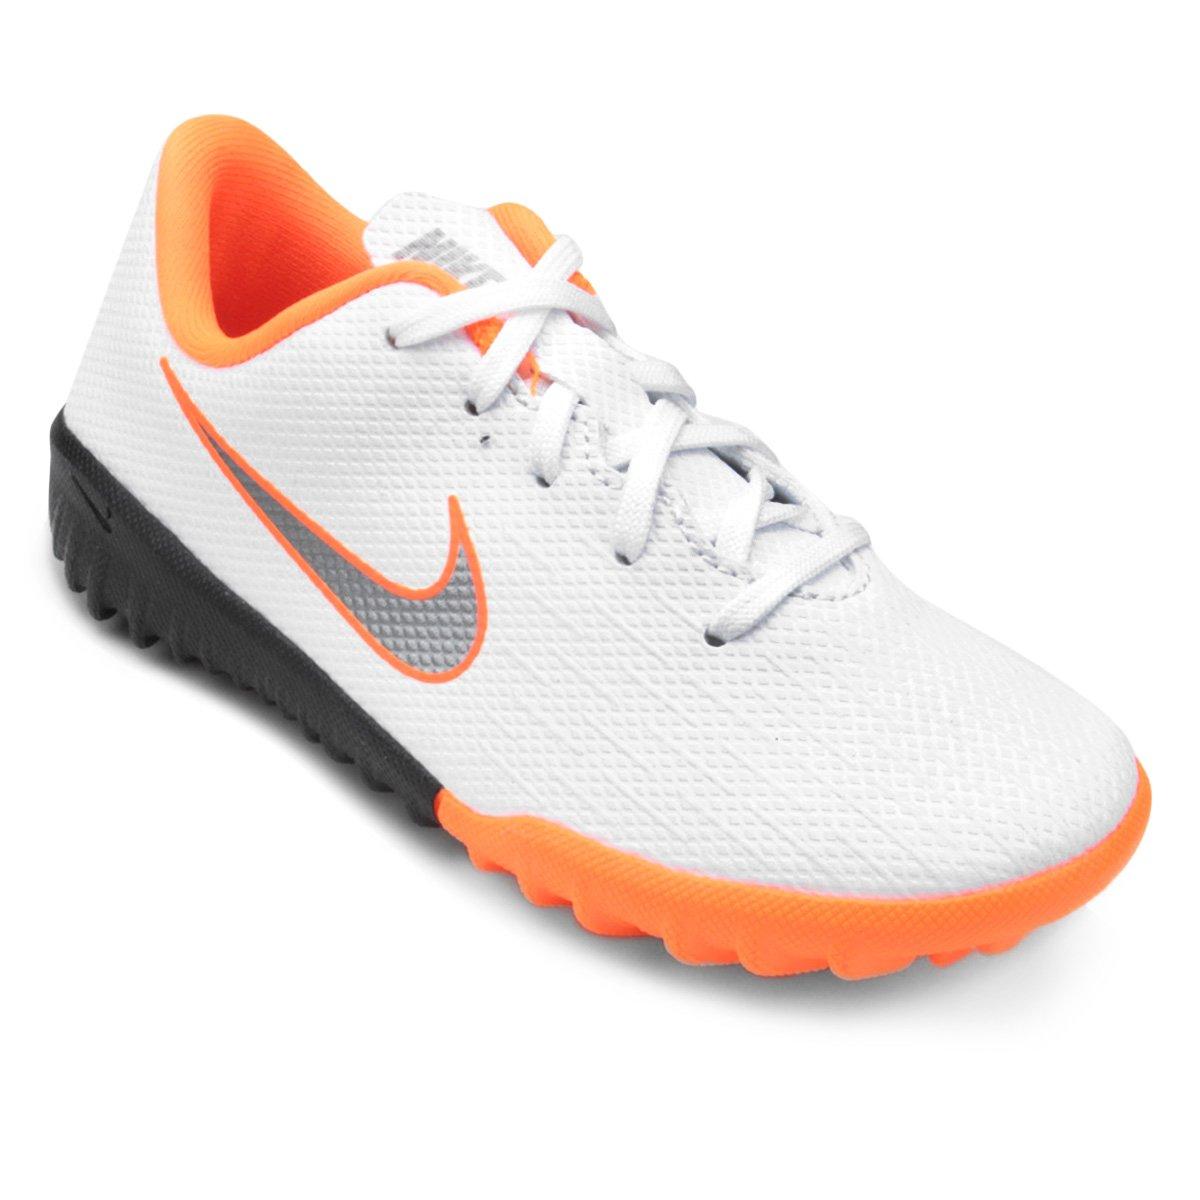 d38d03802d Chuteira Society Infantil Nike Mercurial Vapor 12 Academy - Compre ...